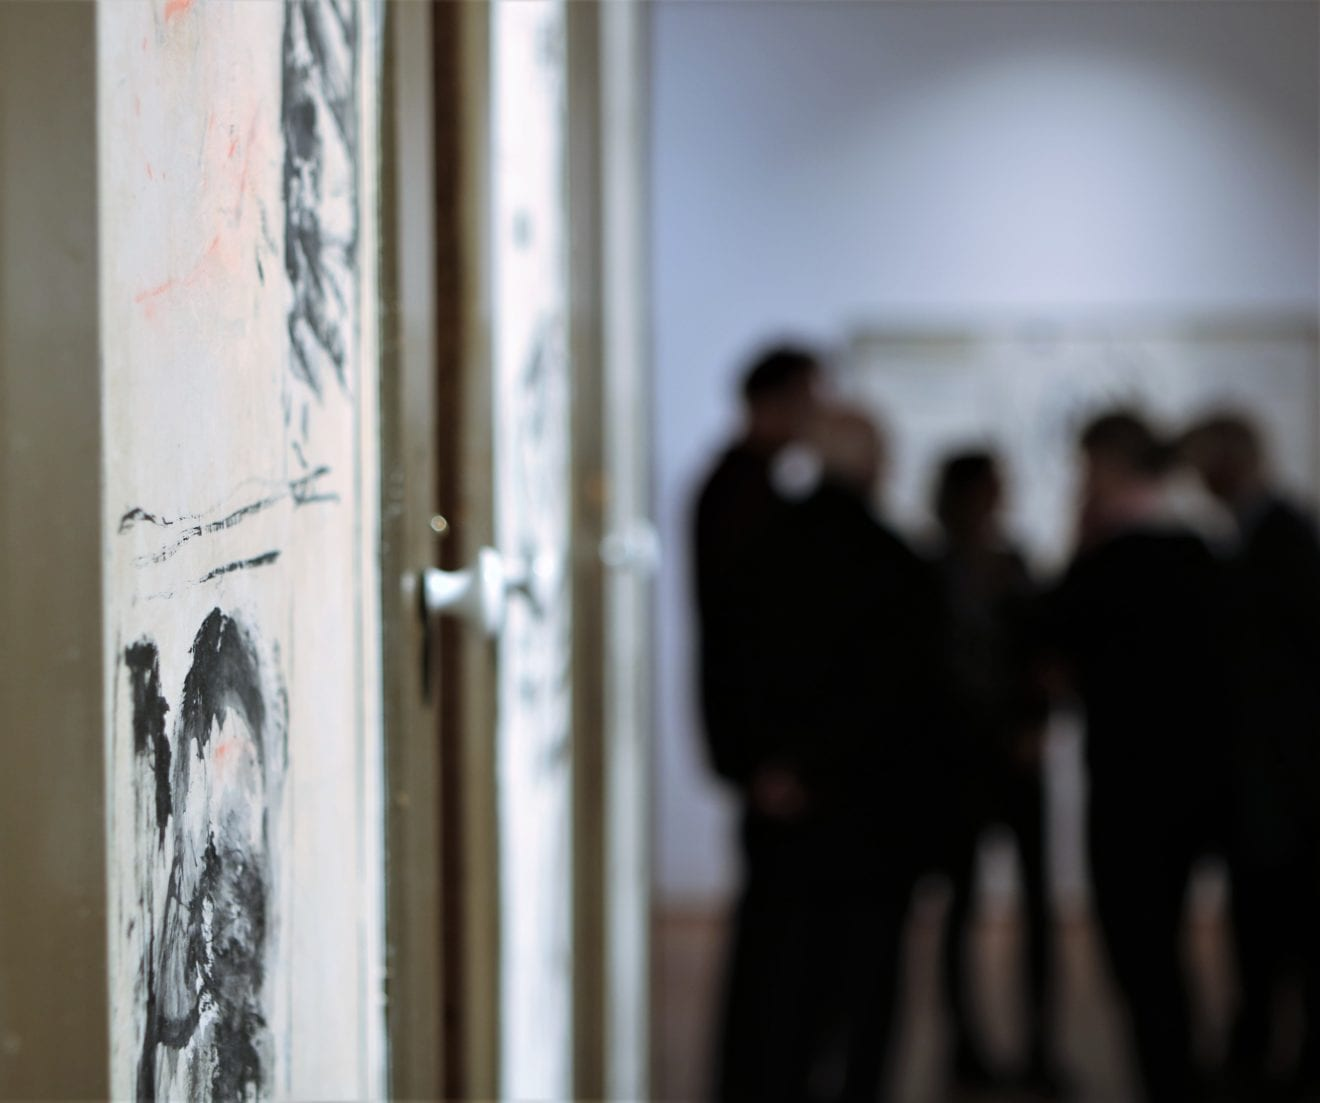 Nyt kunstnermiljø i stort atelier